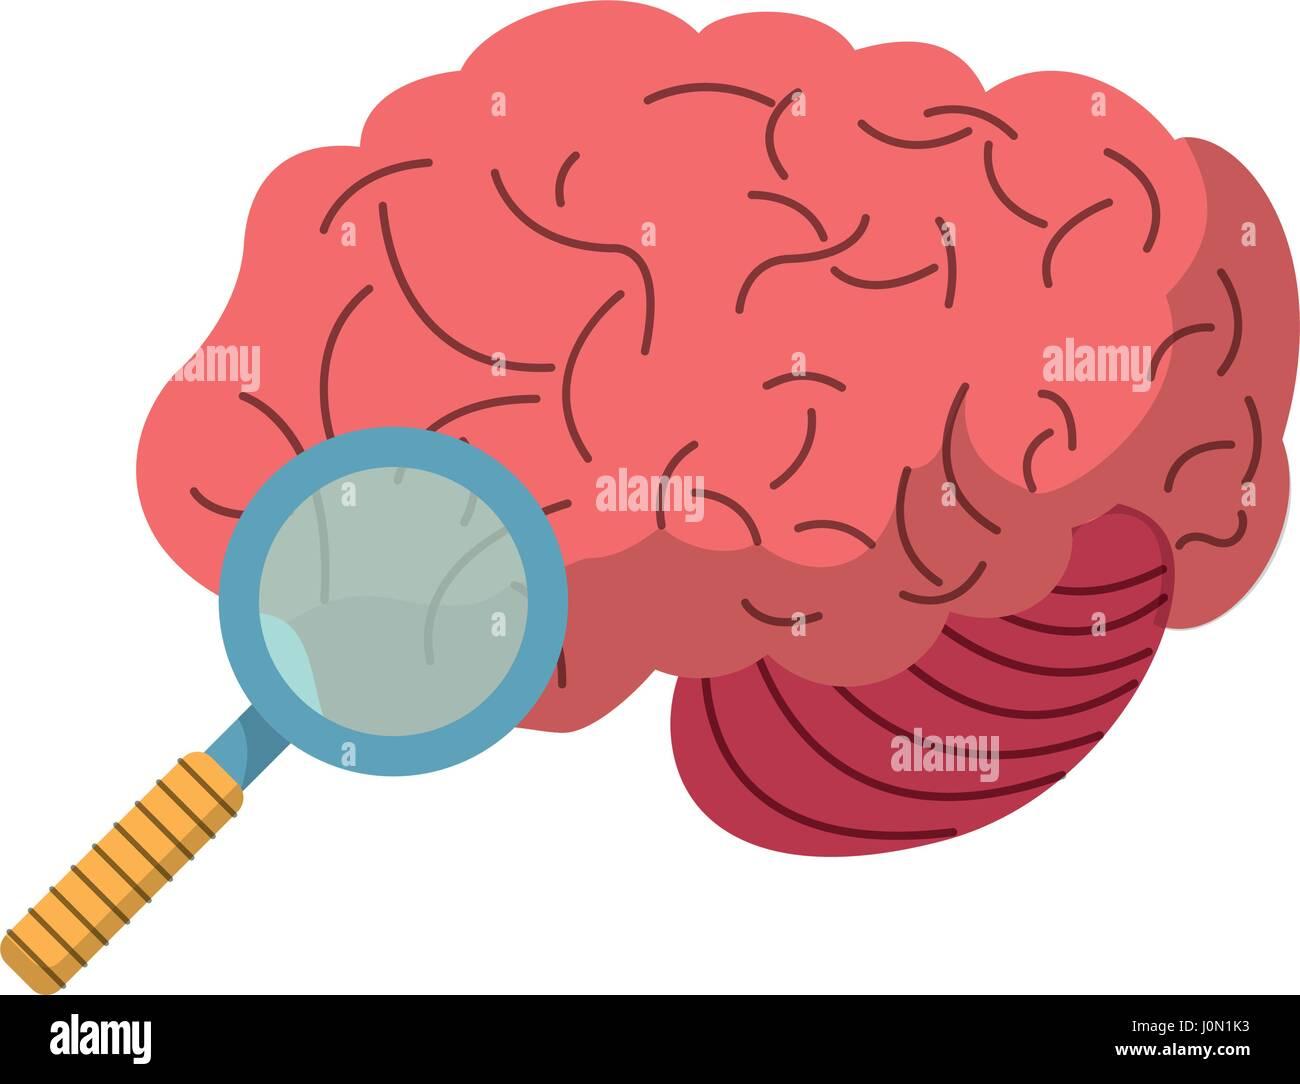 brain search find creativity image - Stock Image